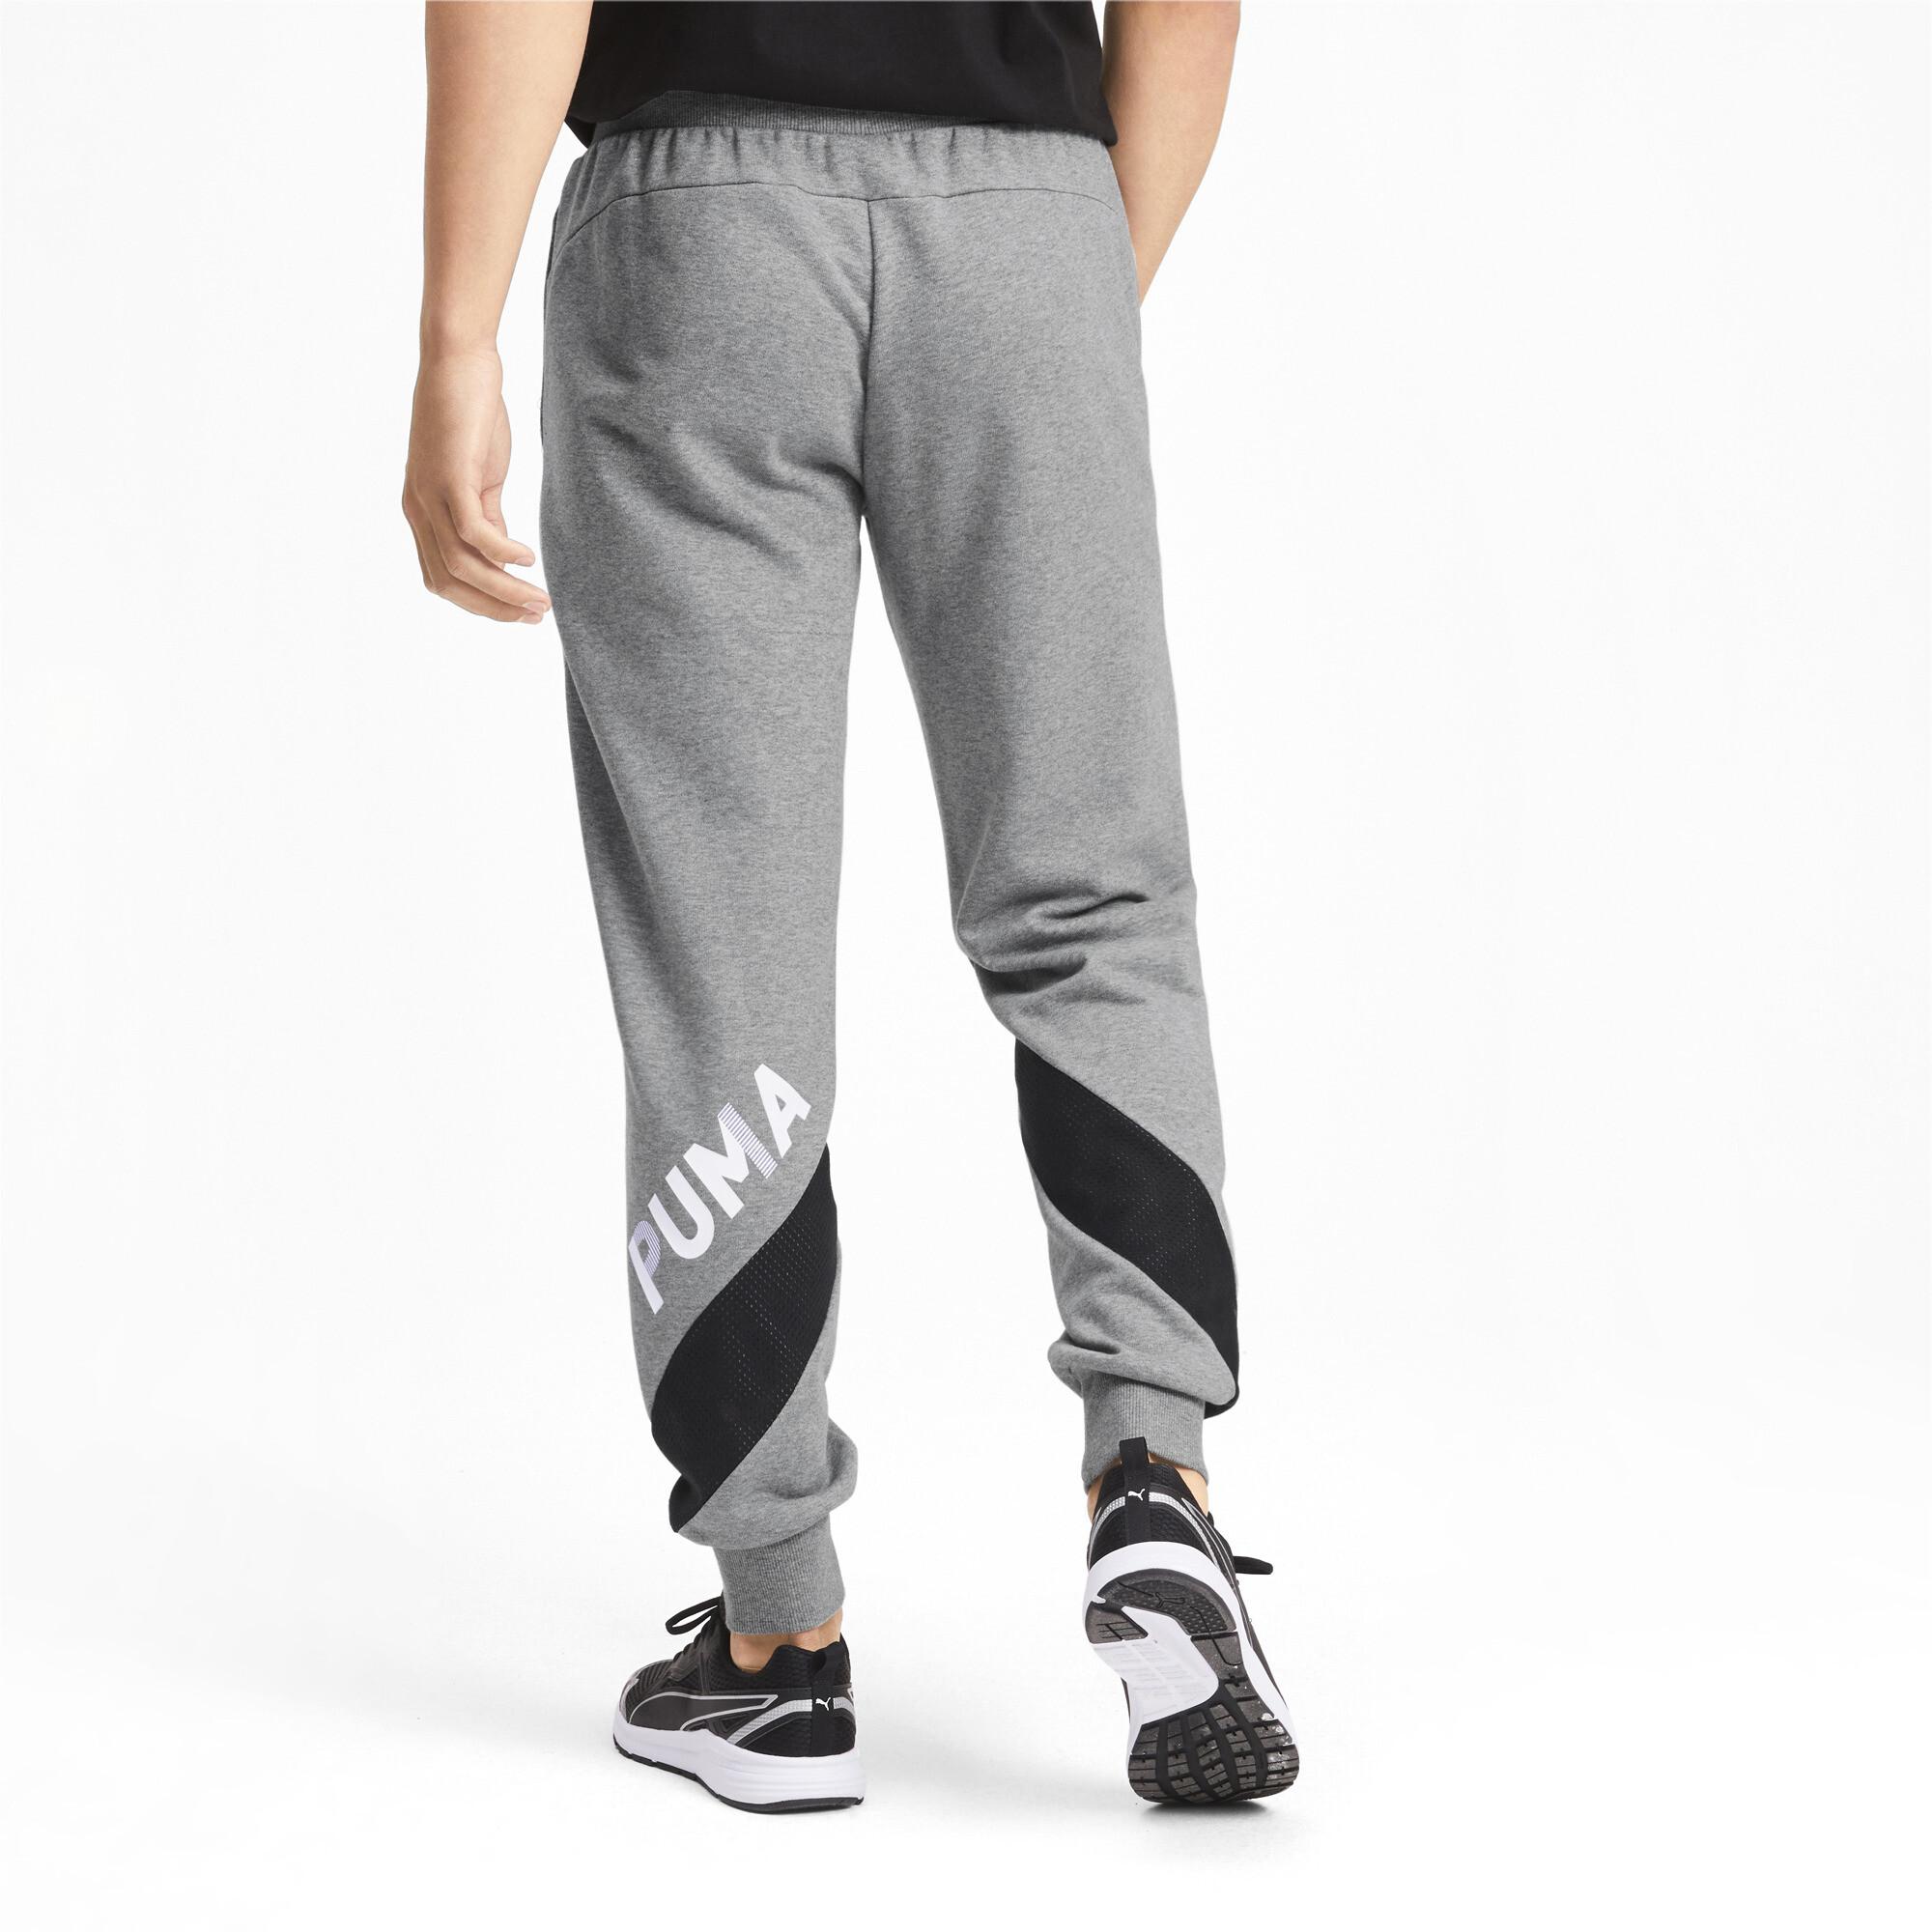 PUMA-Modern-Sports-Men-039-s-Sweatpants-Men-Knitted-Pants-Basics thumbnail 5